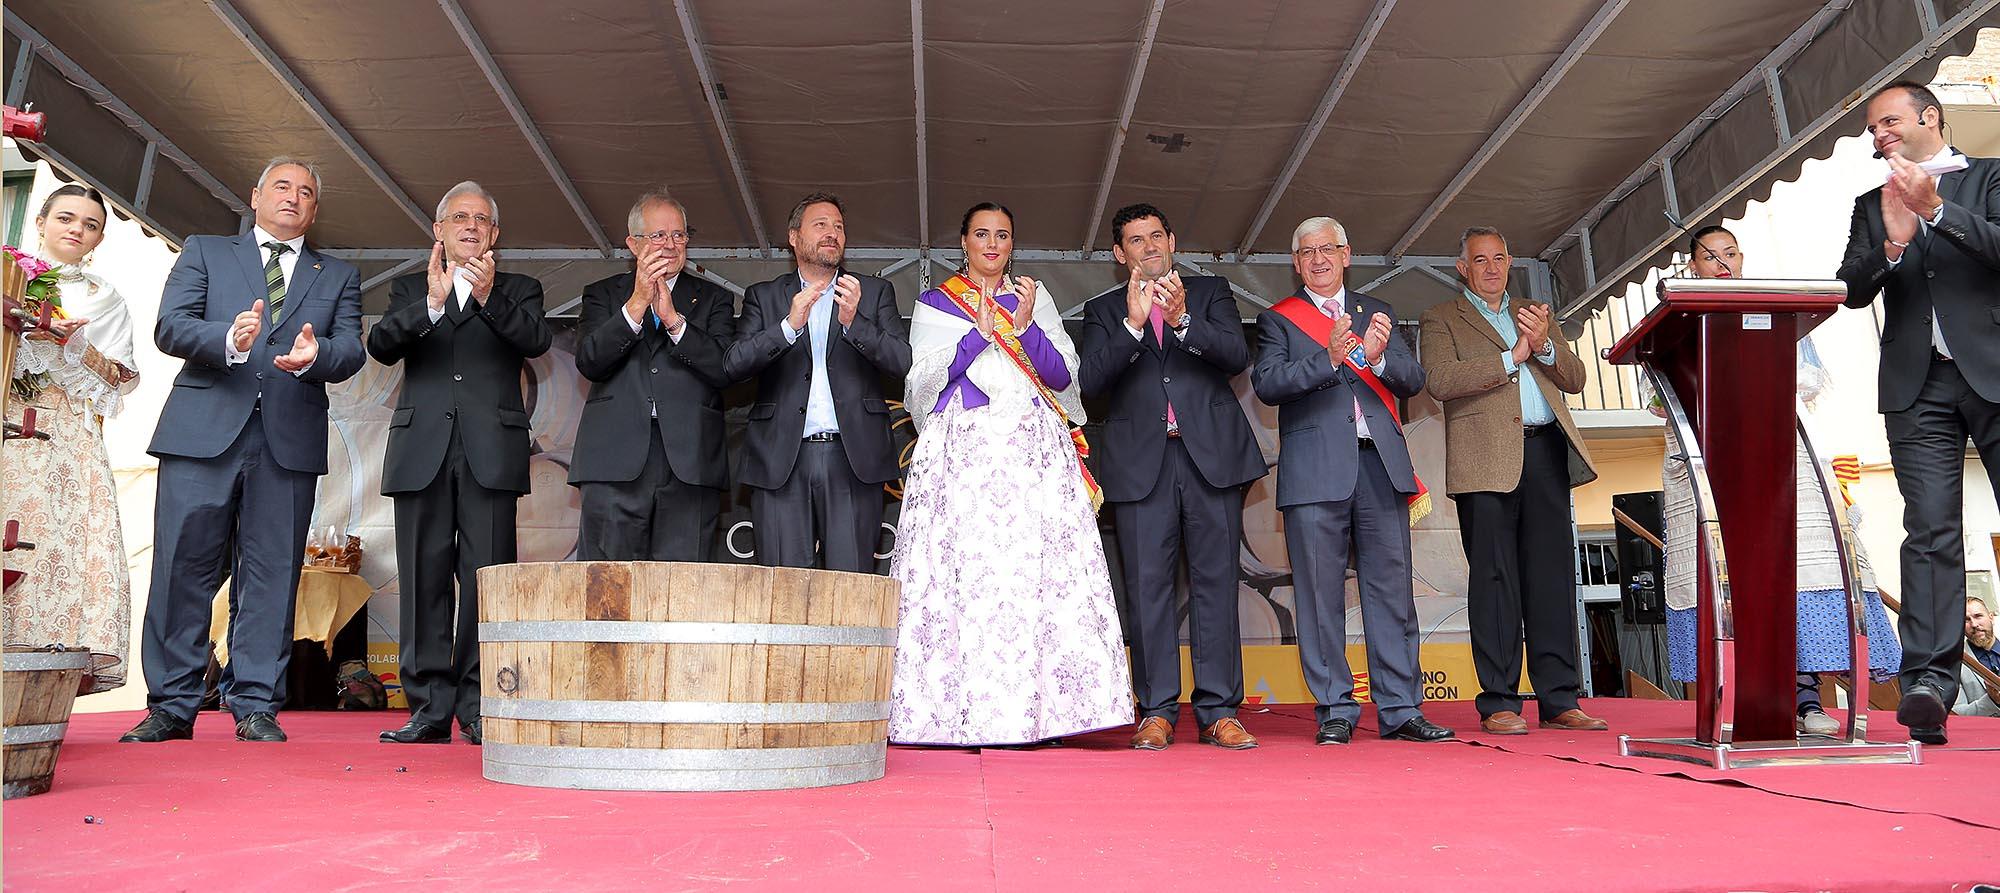 5barricas-Borja-1609-fiesta vendimia09